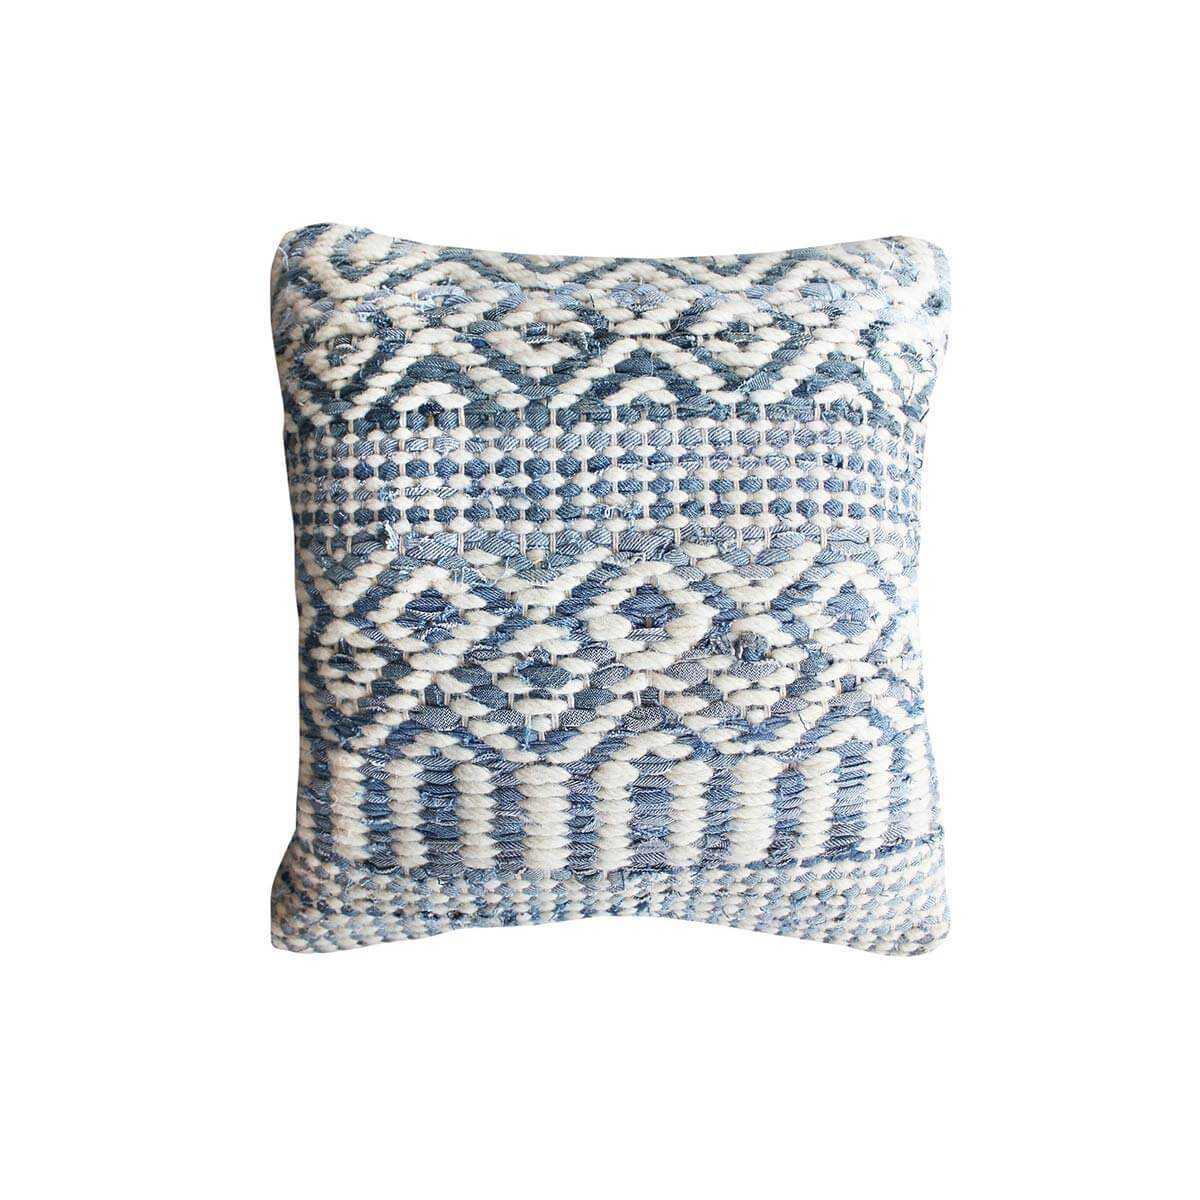 sarah-wool-denim-pillow-in-blue